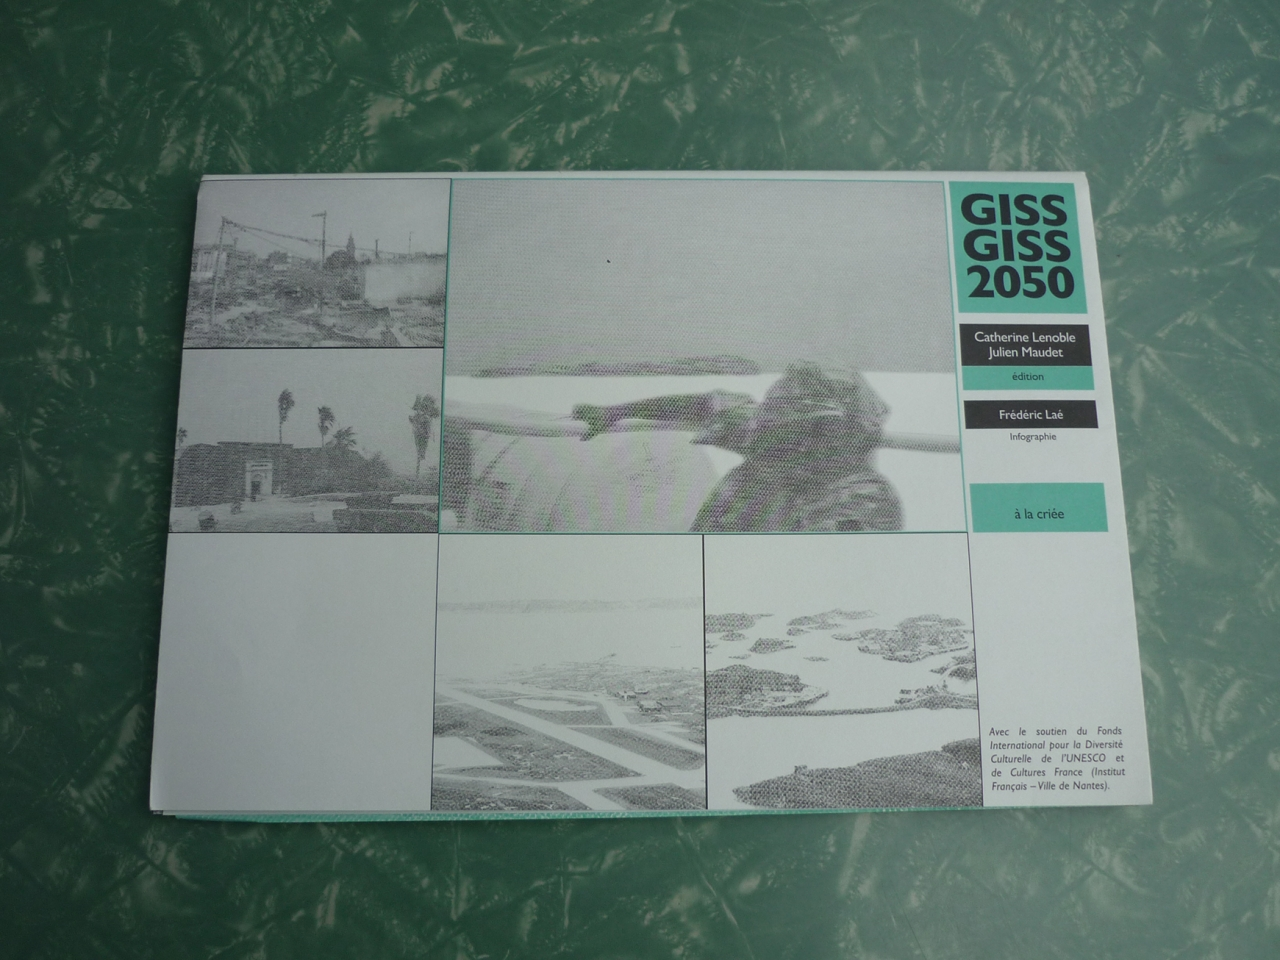 La Houle HRR-05 Giss Giss 2050